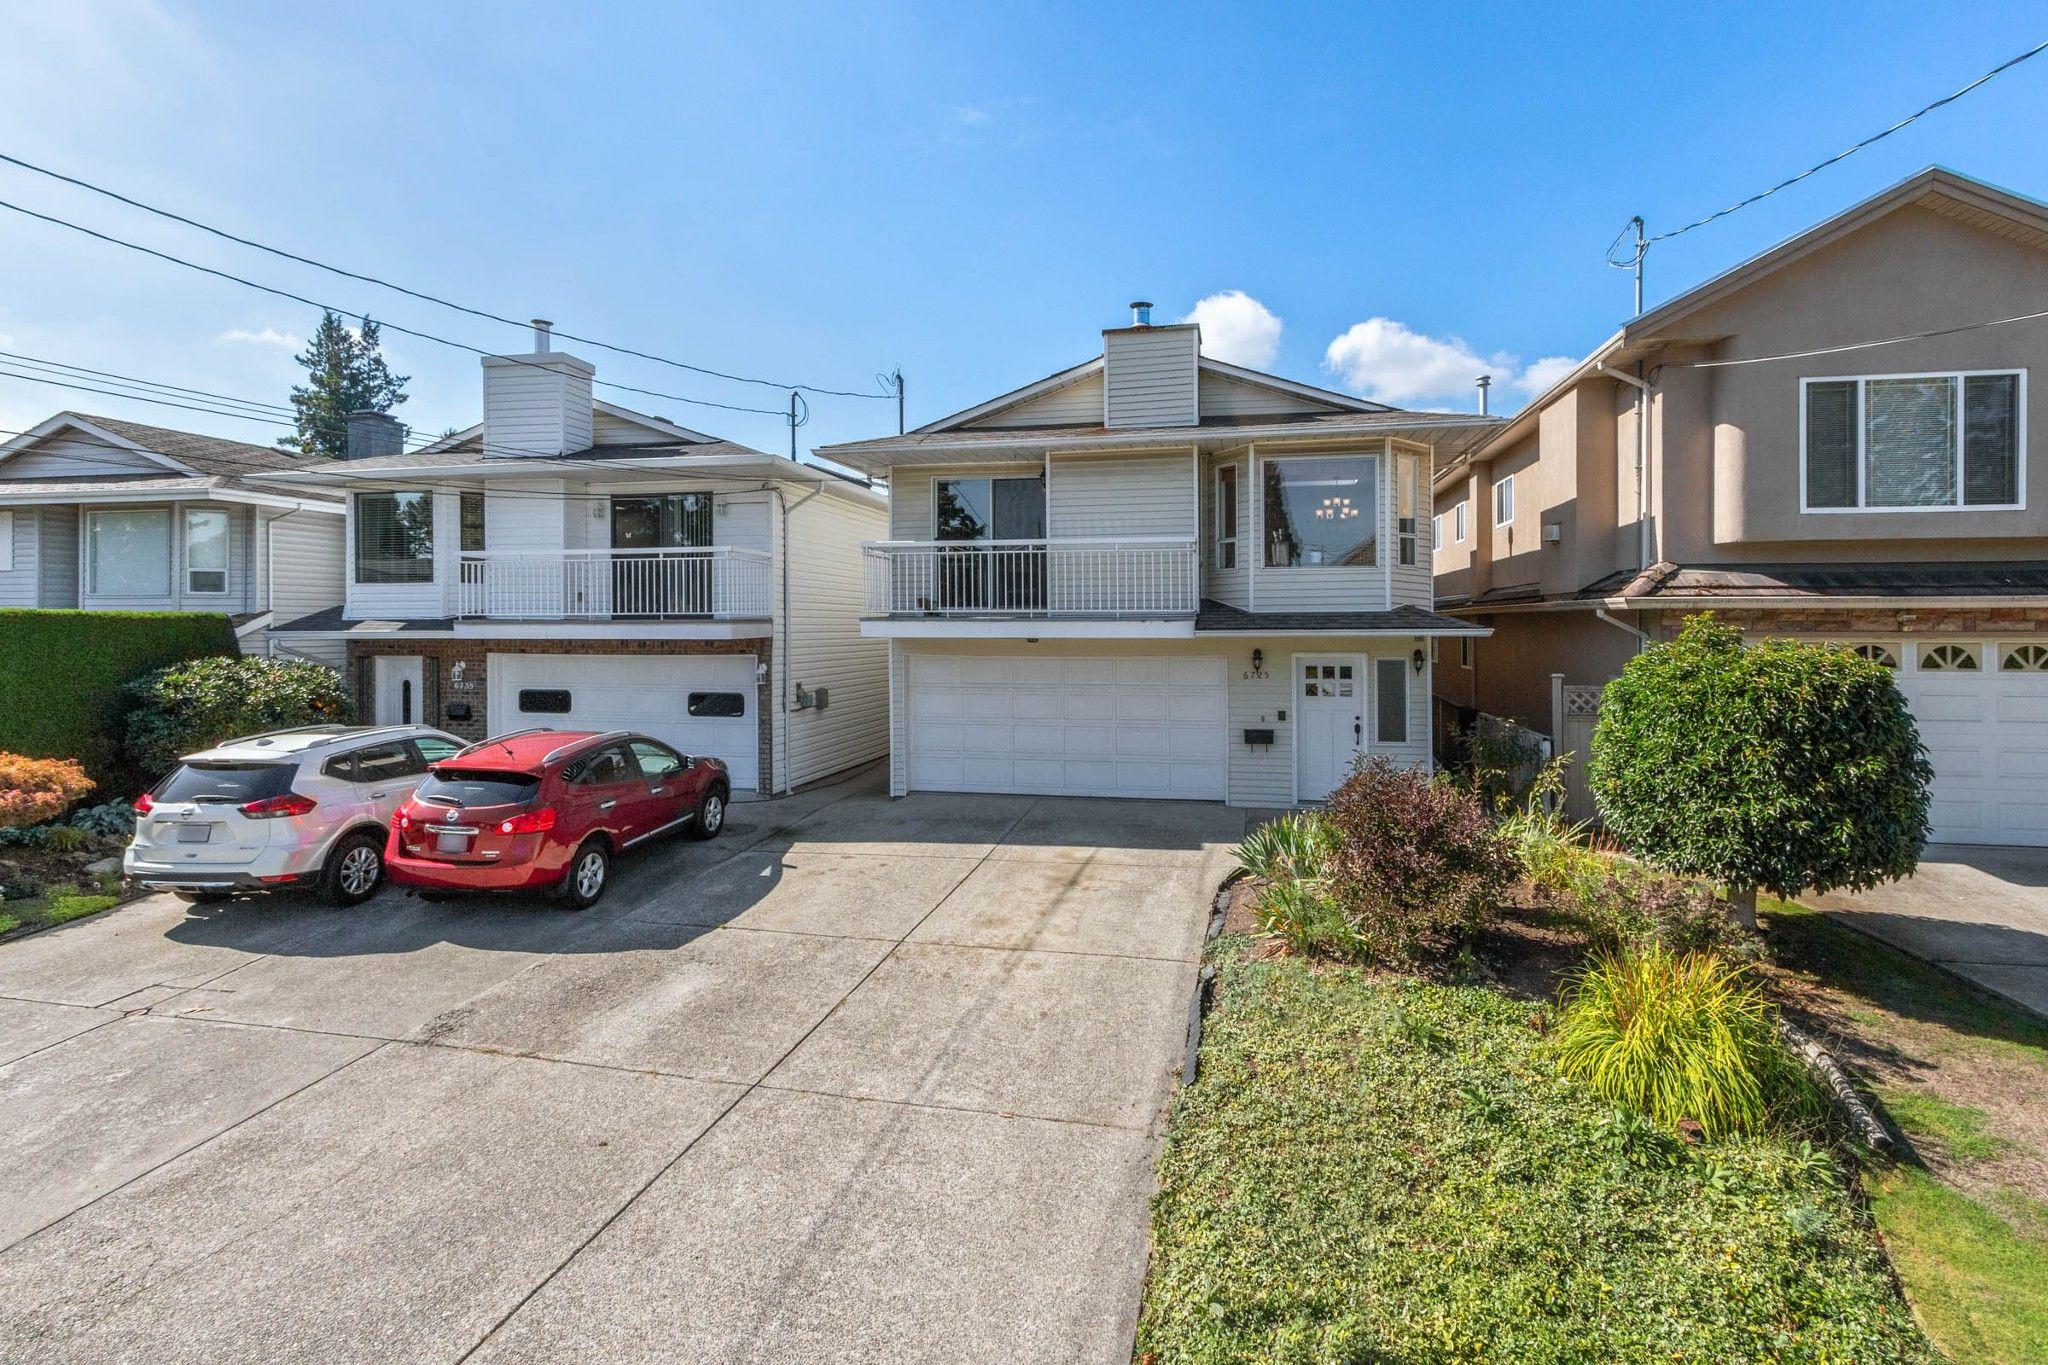 Main Photo: 6725 SALISBURY Avenue in Burnaby: Highgate House for sale (Burnaby South)  : MLS®# R2621419